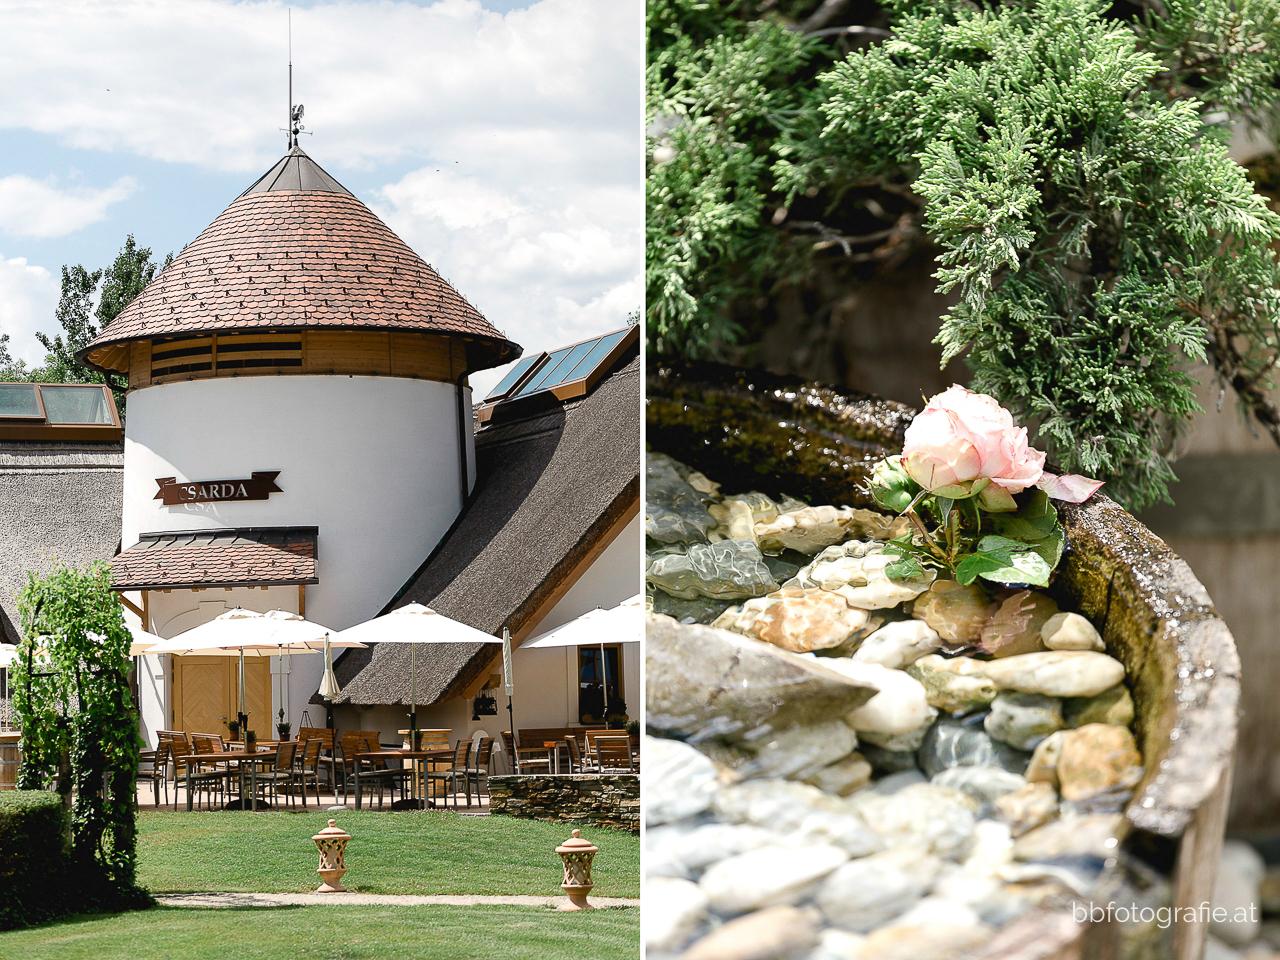 Hochzeitsfotograf, Hochzeitsfotograf Burgenland, Locationsdetails, Hochzeitslocation Burgenland, Hochzeitslocation Villa Vita Pannonia, Gartenhochzeit, b&b fotografie